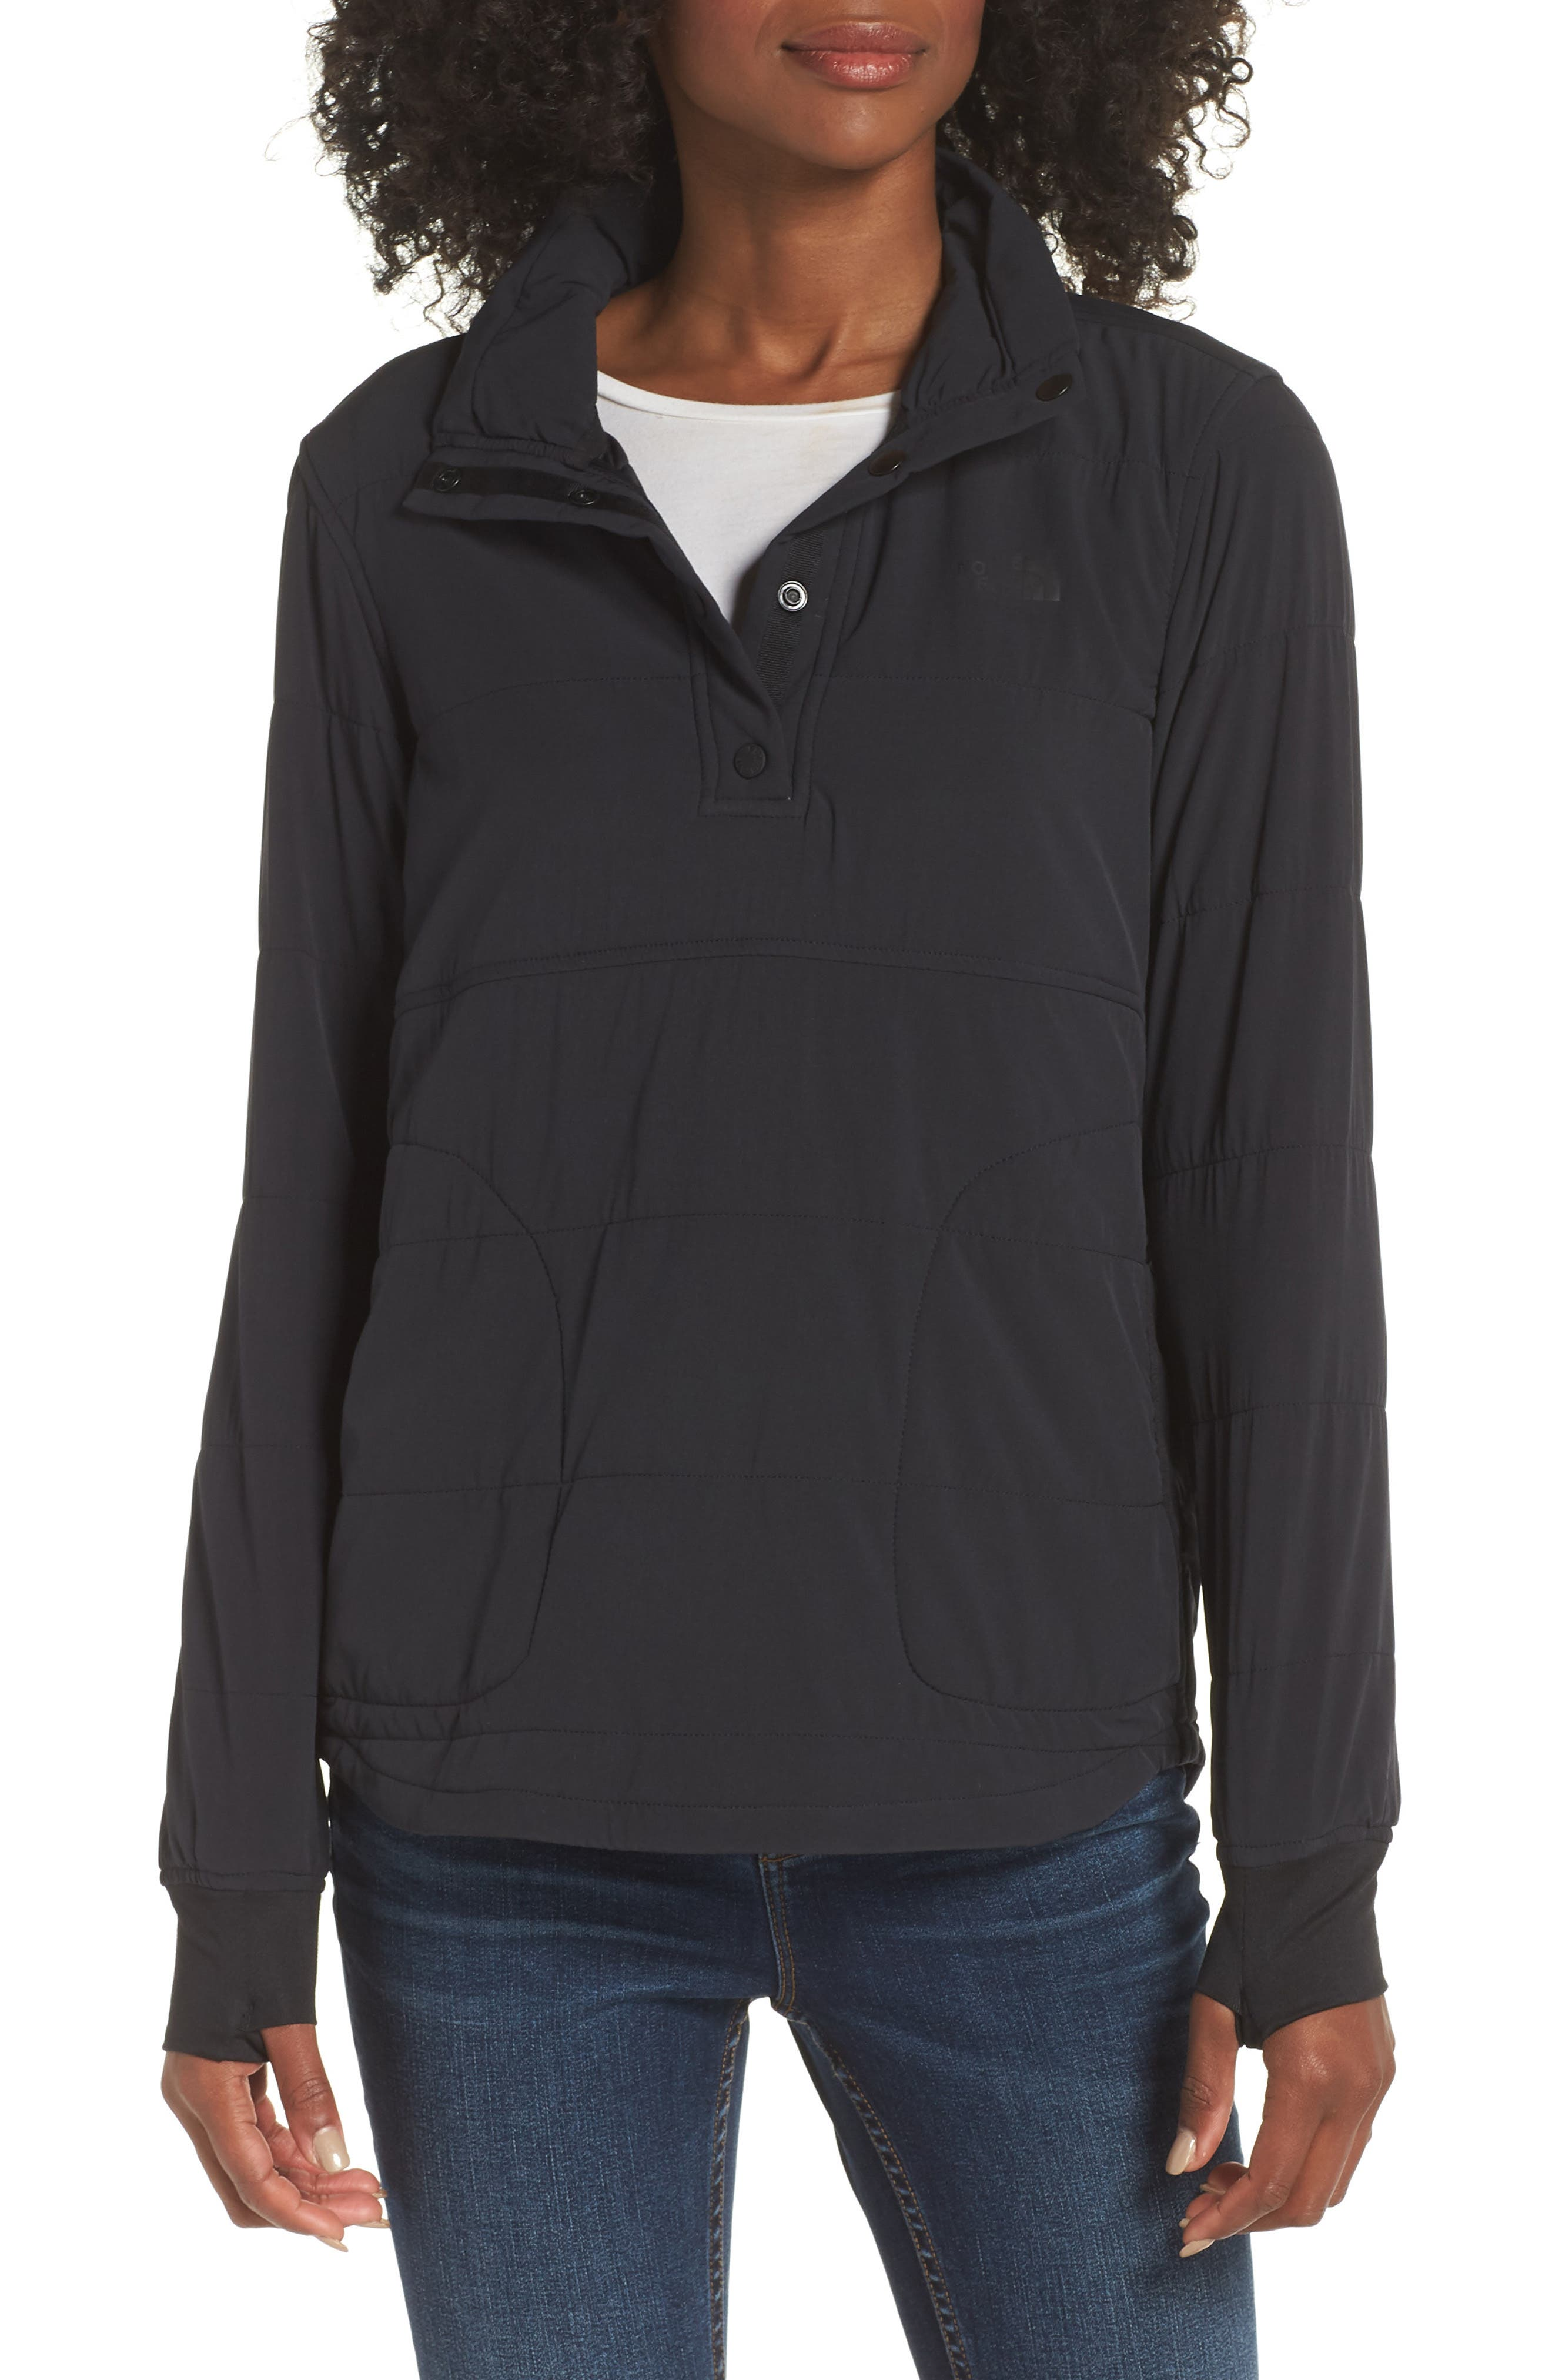 Mountain Snap Neck Sweatshirt,                         Main,                         color, 001